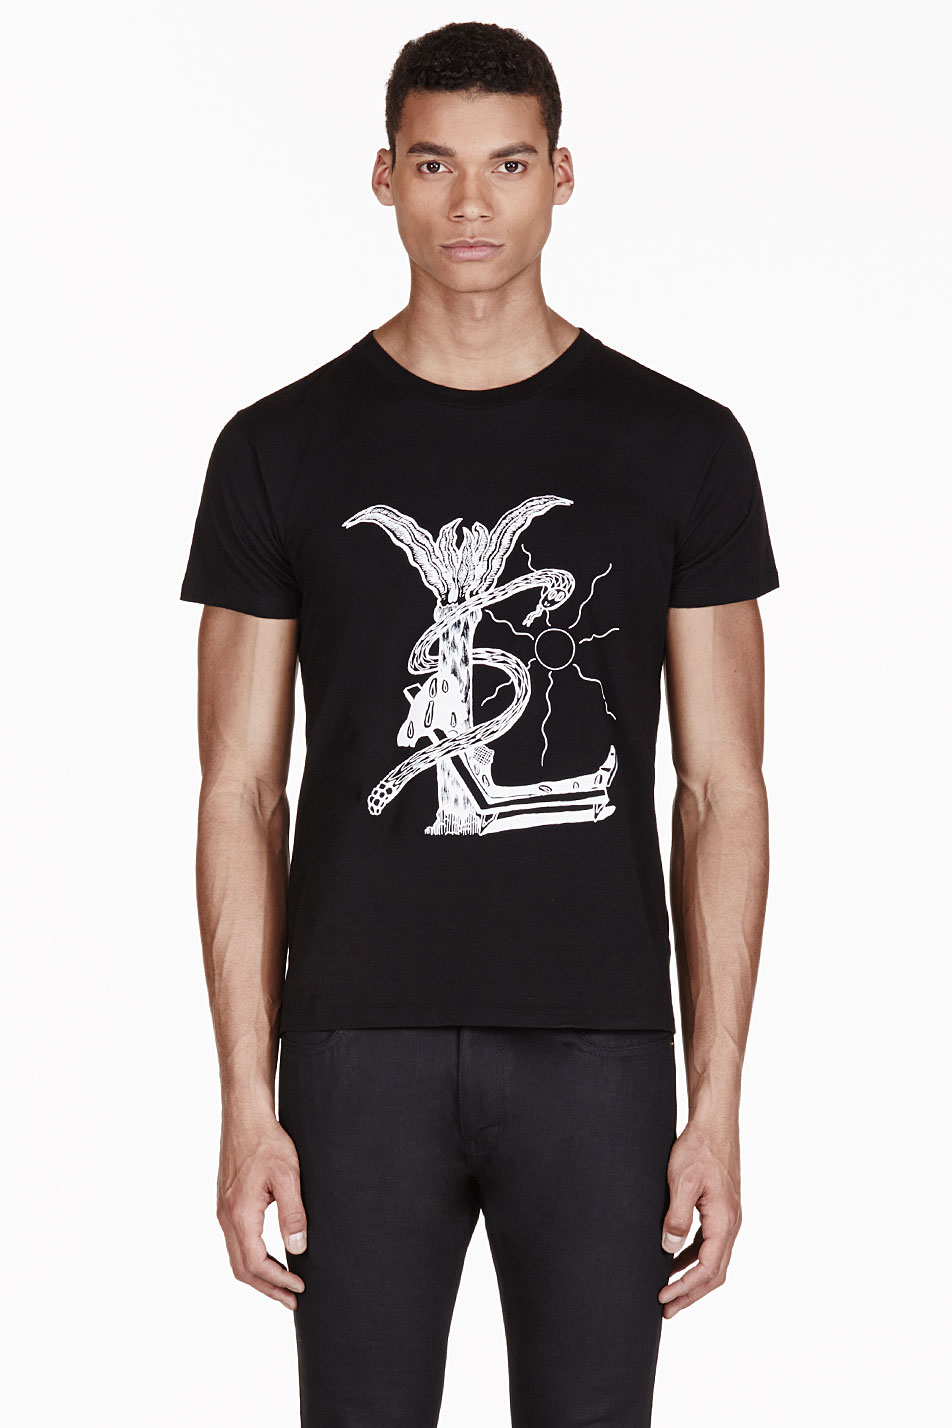 saint laurent black modified ysl logo t_shirt